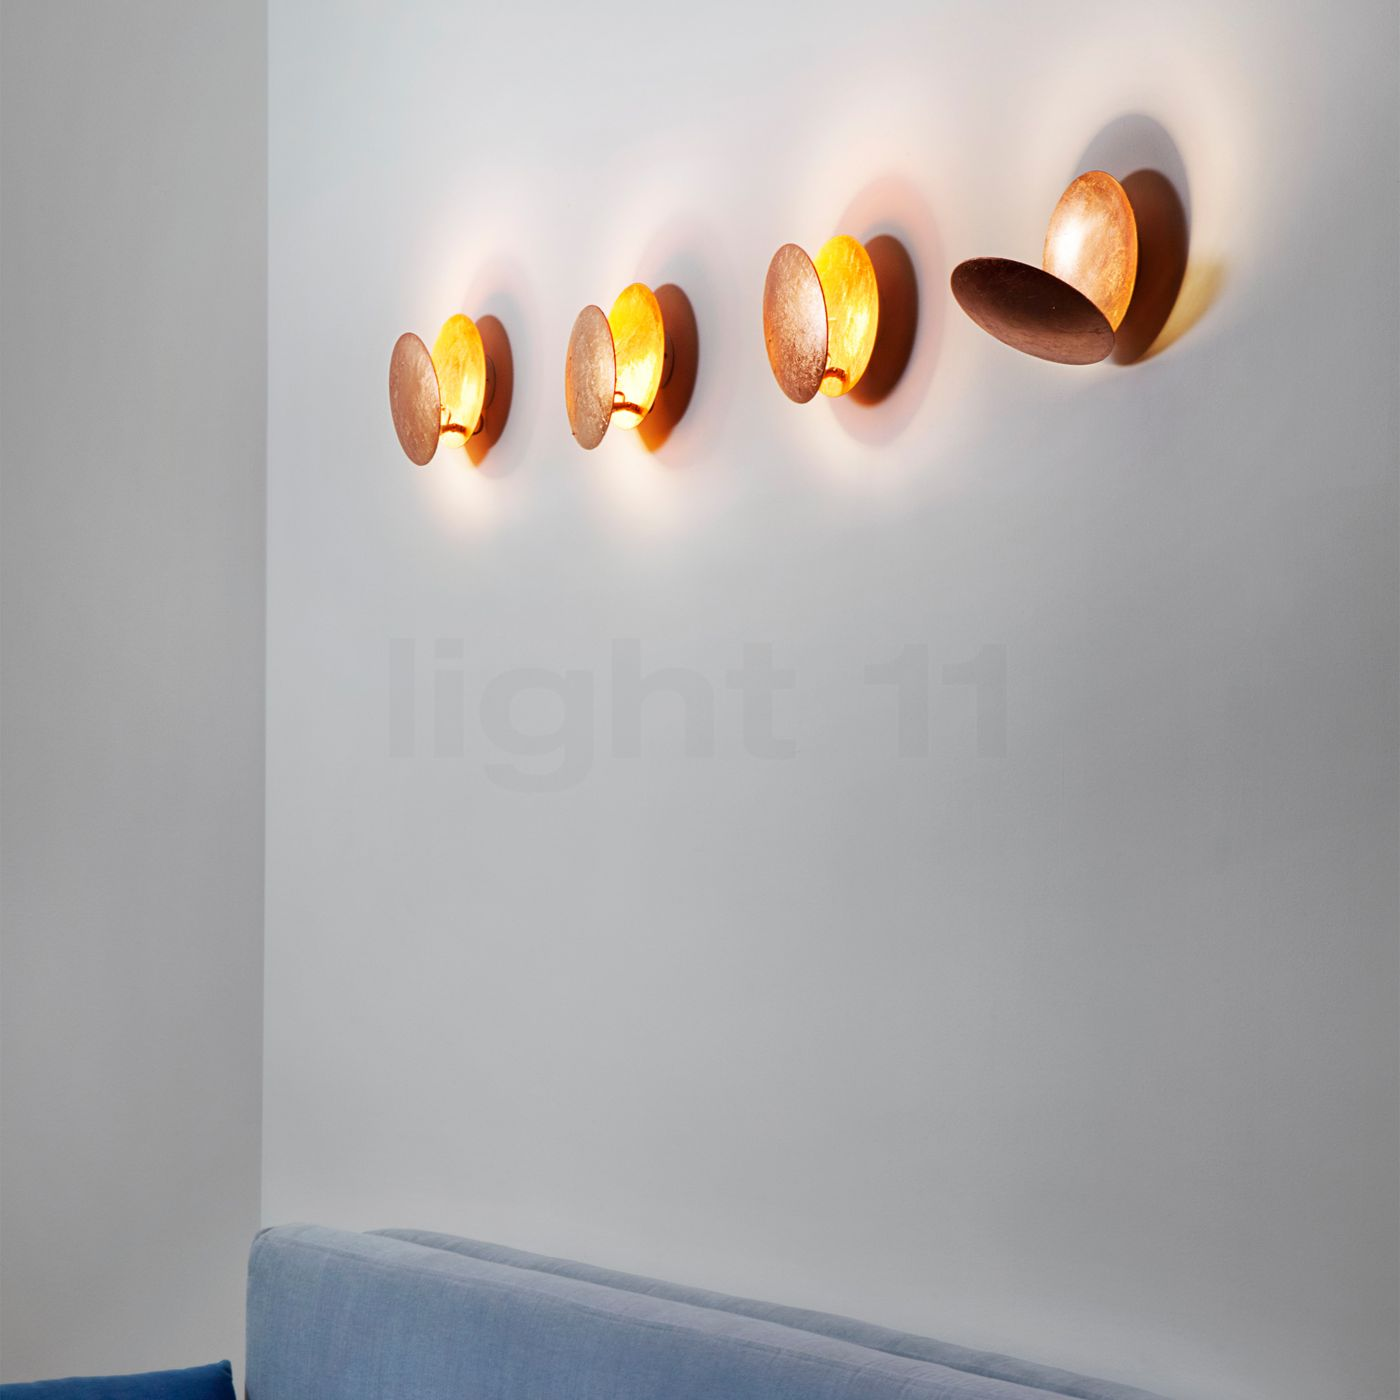 Catellani & Smith Lederam W ø17 cm kaufen bei light11.de